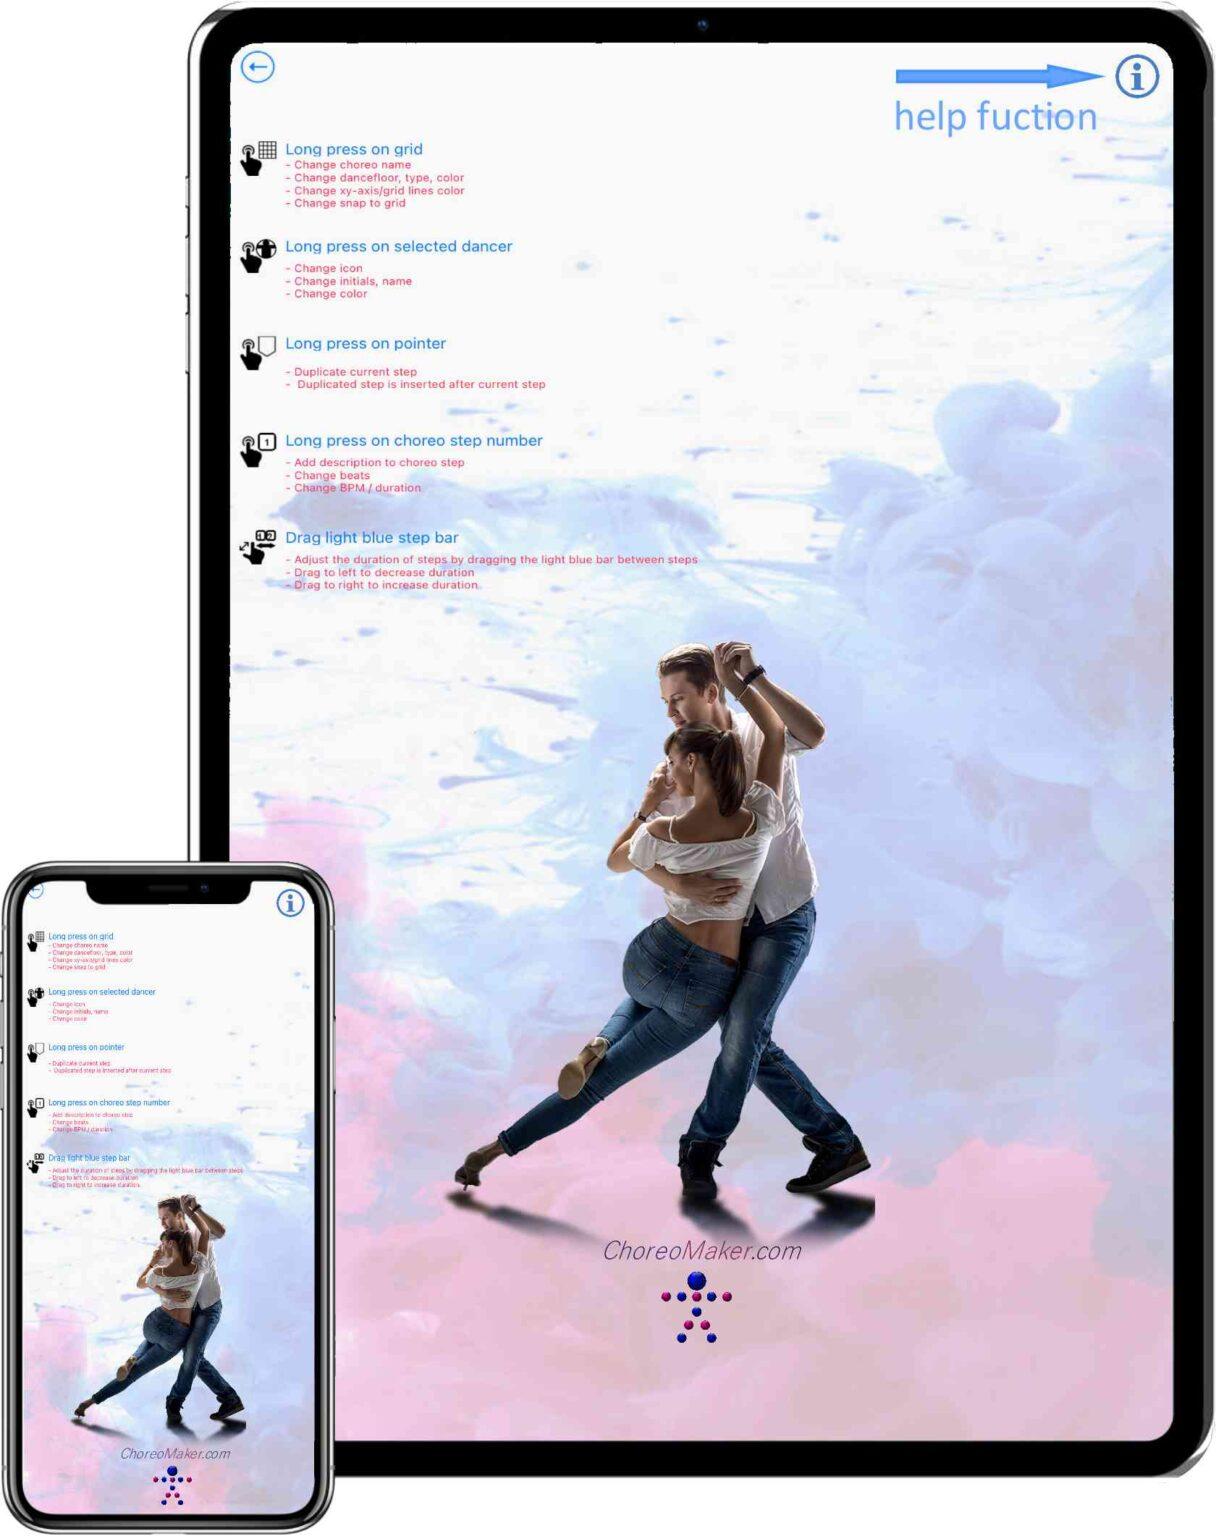 ipad-iphone helpsm